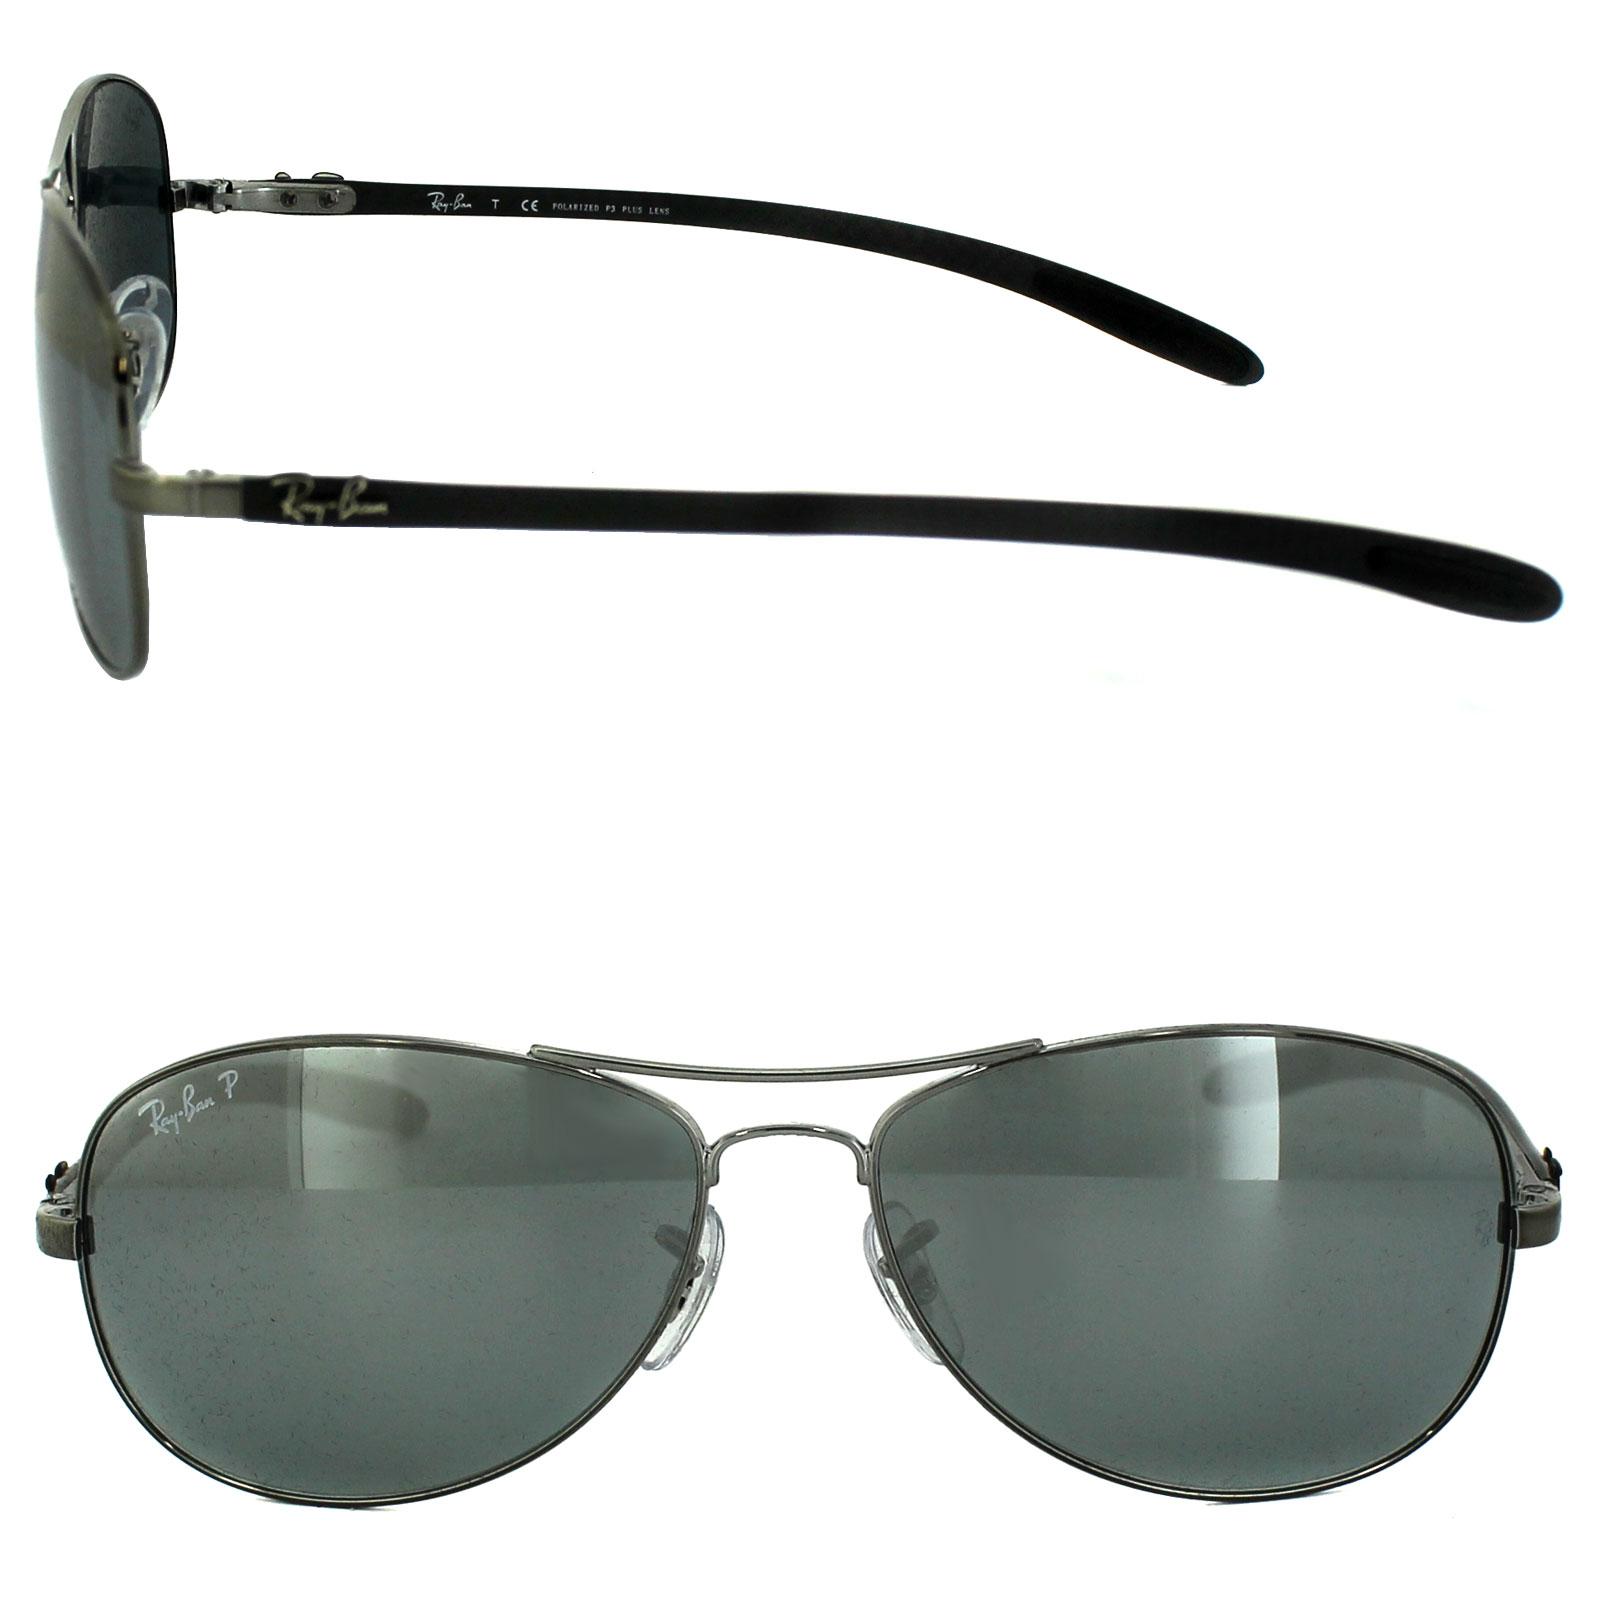 221b4c22ca Sentinel Ray-Ban Sunglasses 8301 004 K6 Shiny Gunmetal Grey Polarized